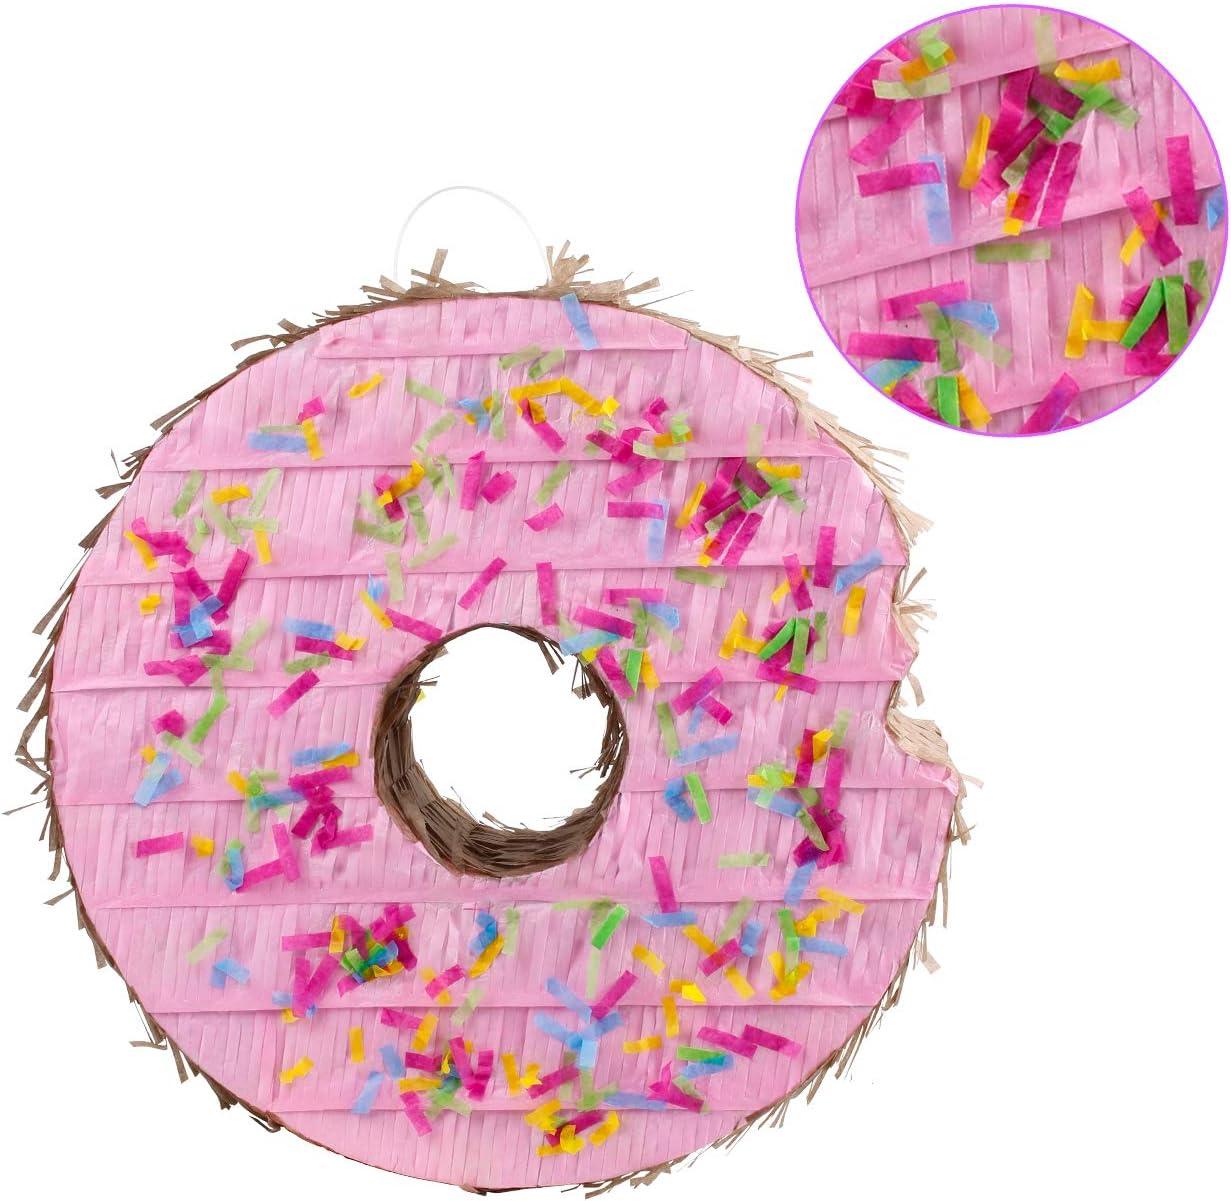 kaimei Donut Pinata Small Pinata for Birthday Anniversary Celebration Decoration Theme Party Cinco de Mayo Fiesta Supplies with Stick Multicolor Colorful Pinata